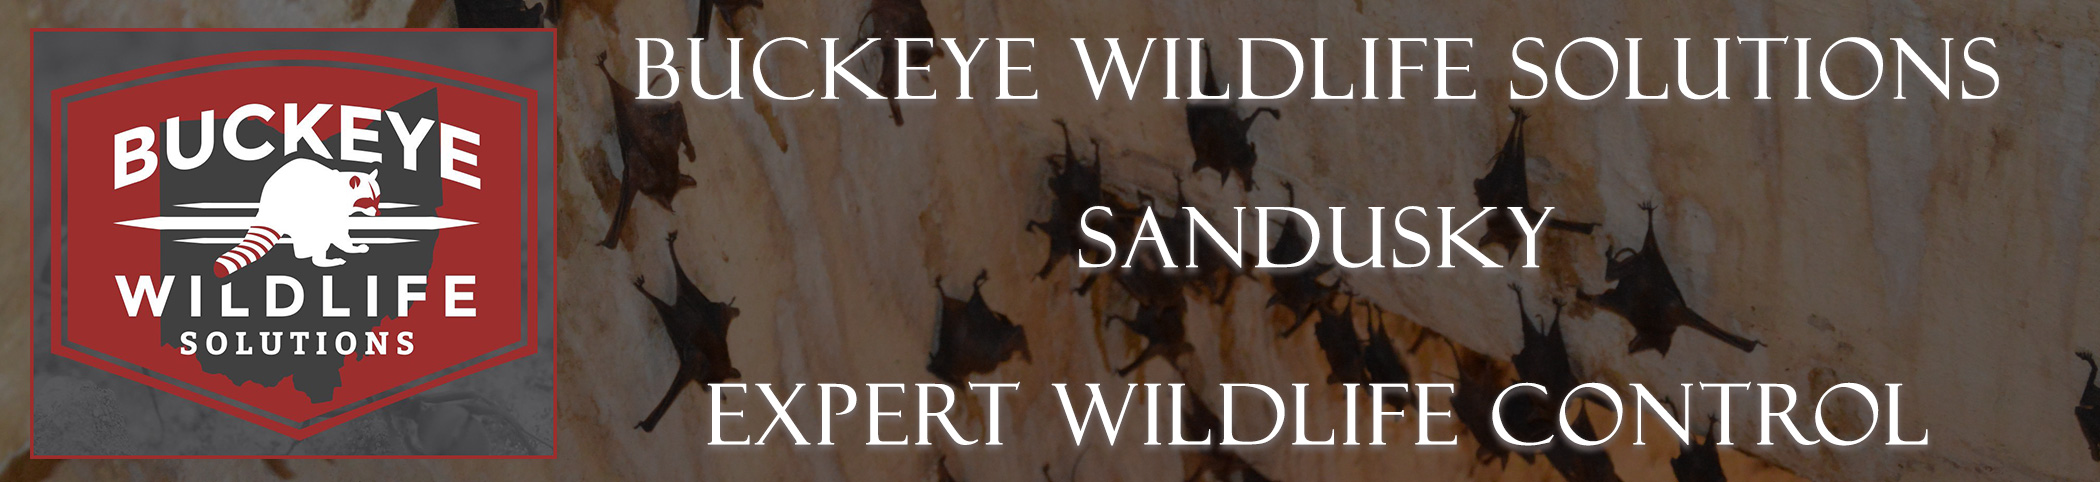 Pickerington-buckeye-wildlife-solutions-ohio-header-image